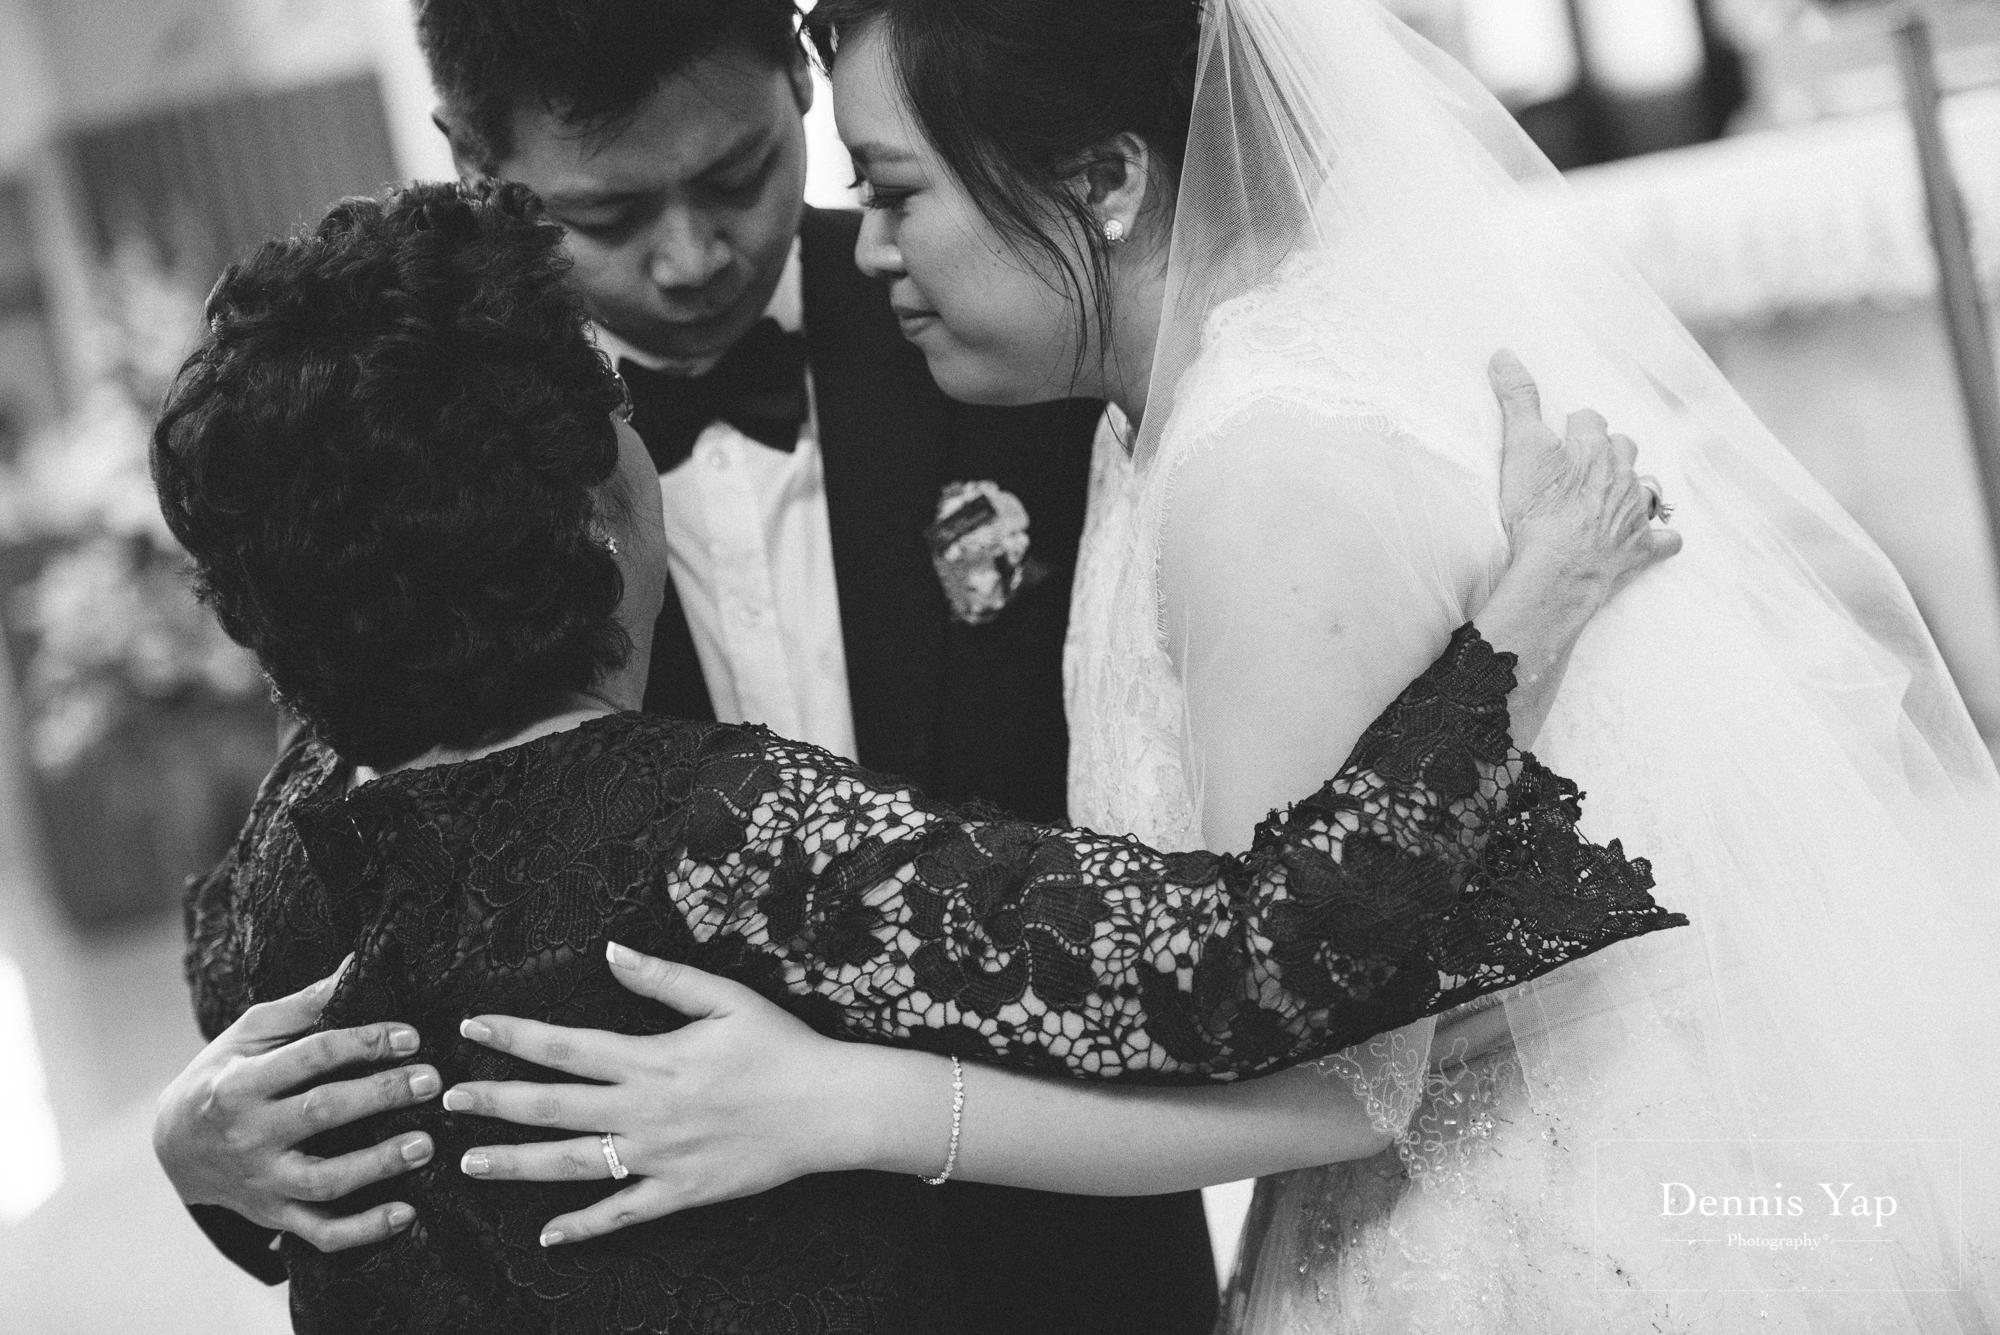 ino sheri black white church wedding st thomas more subang jaya dennis yap photography touching love beloved australia indonesia-33.jpg